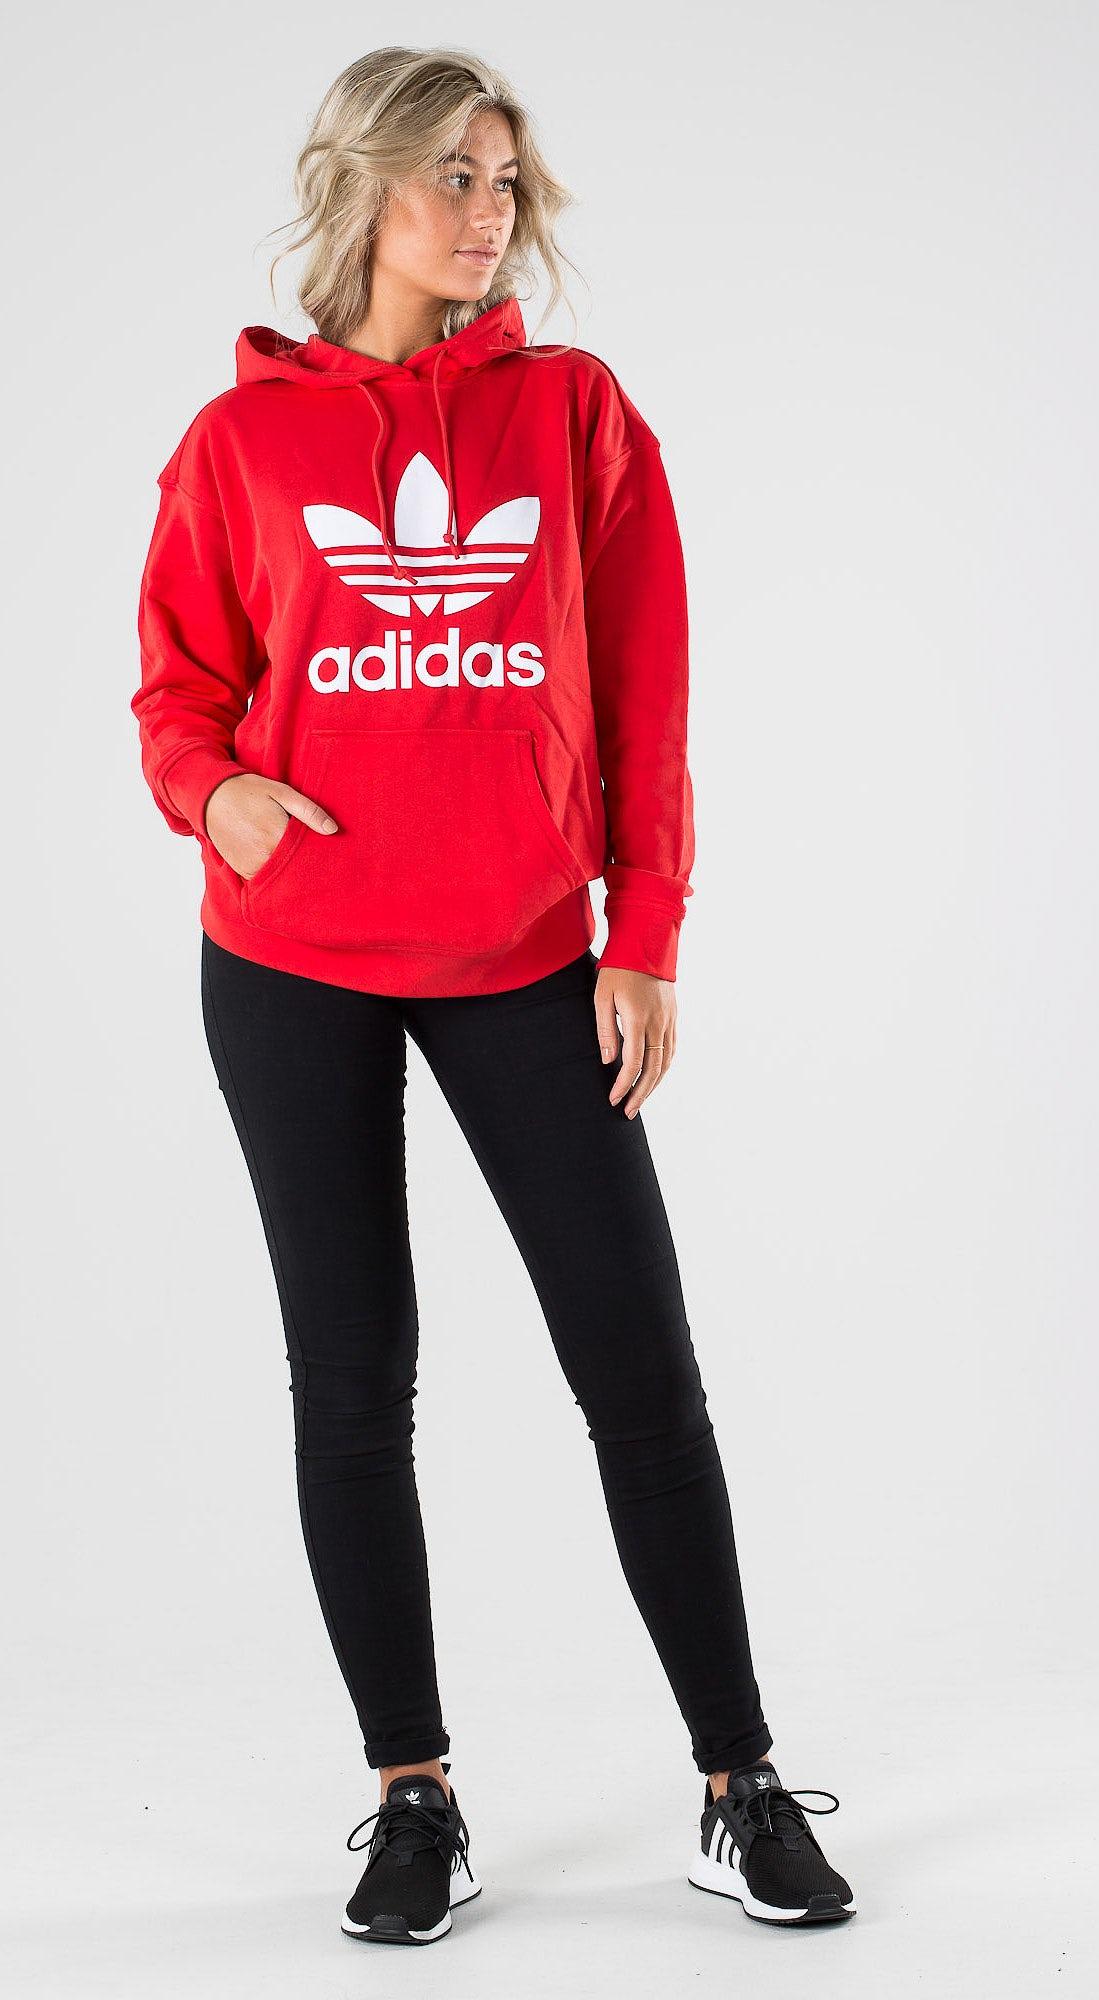 Adidas Originals Trefoil Hoodie Lush Red White